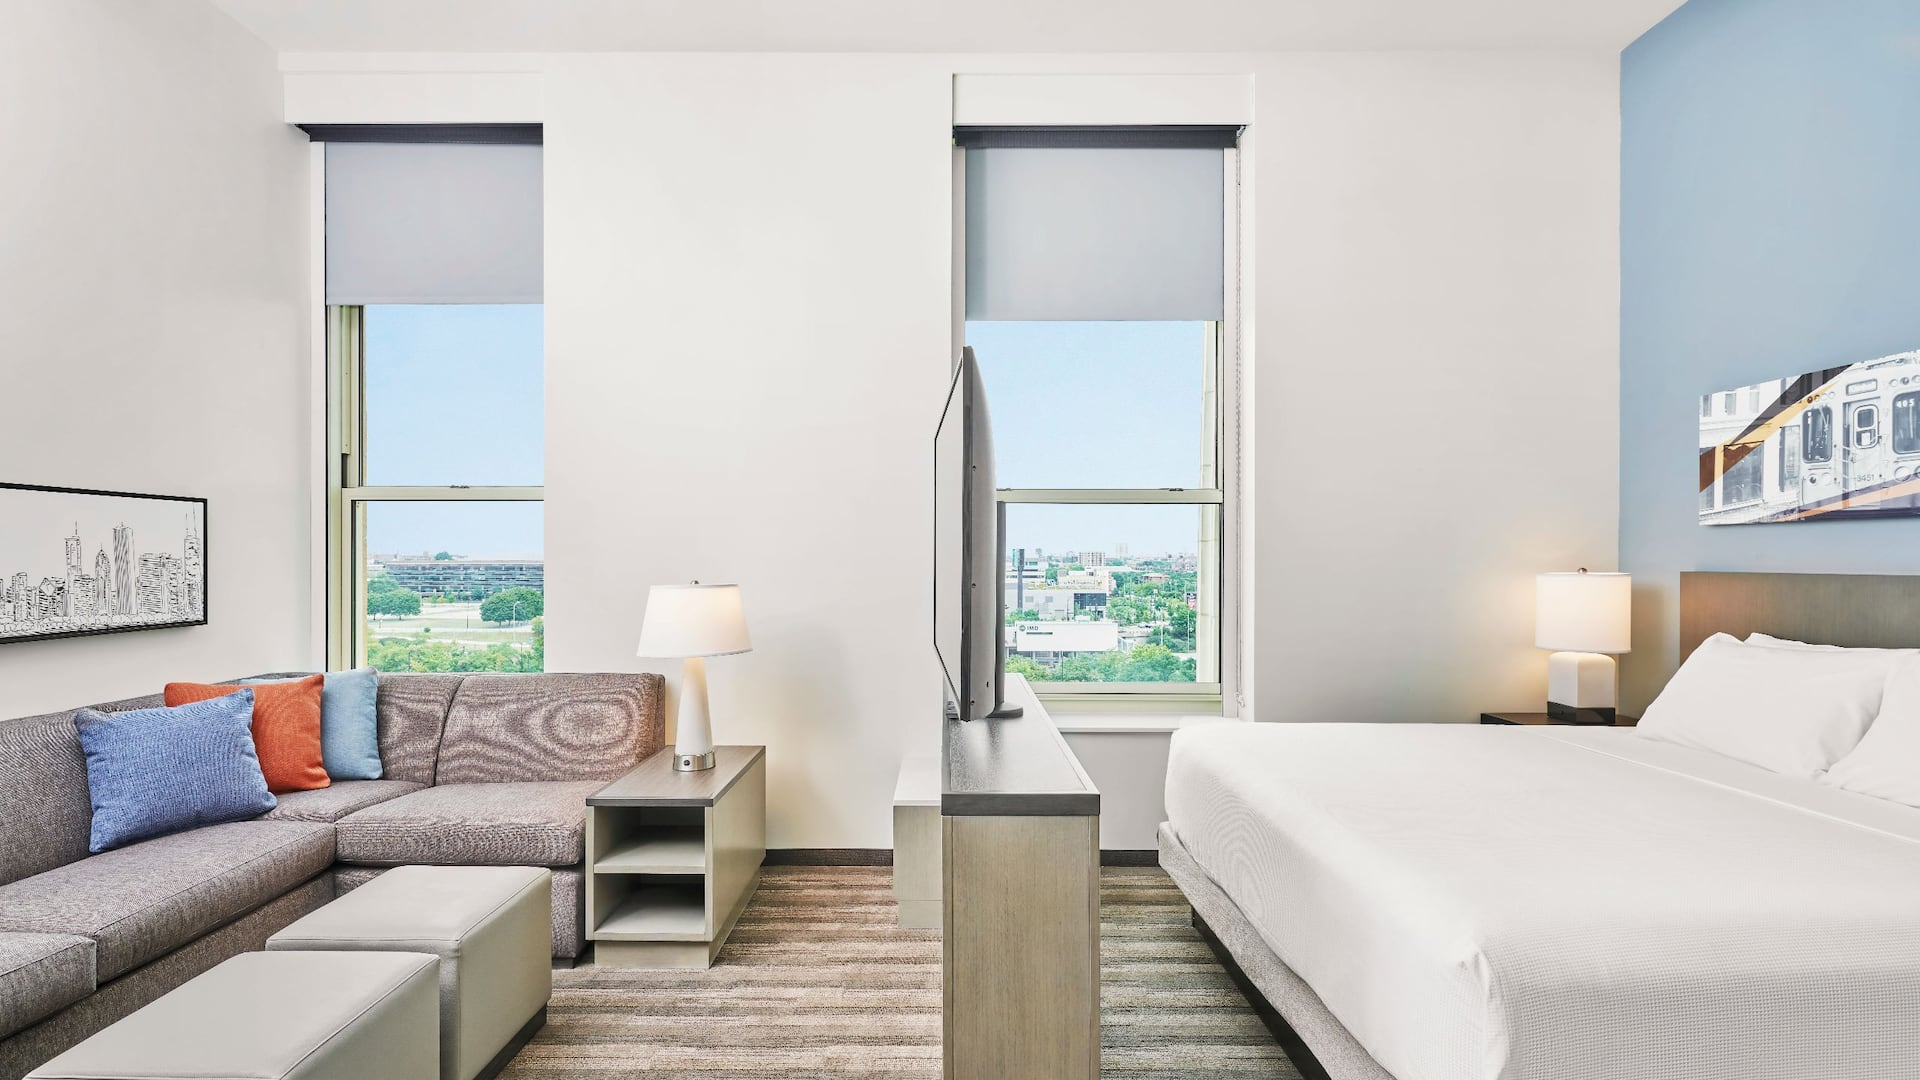 Hyatt House Guestroom